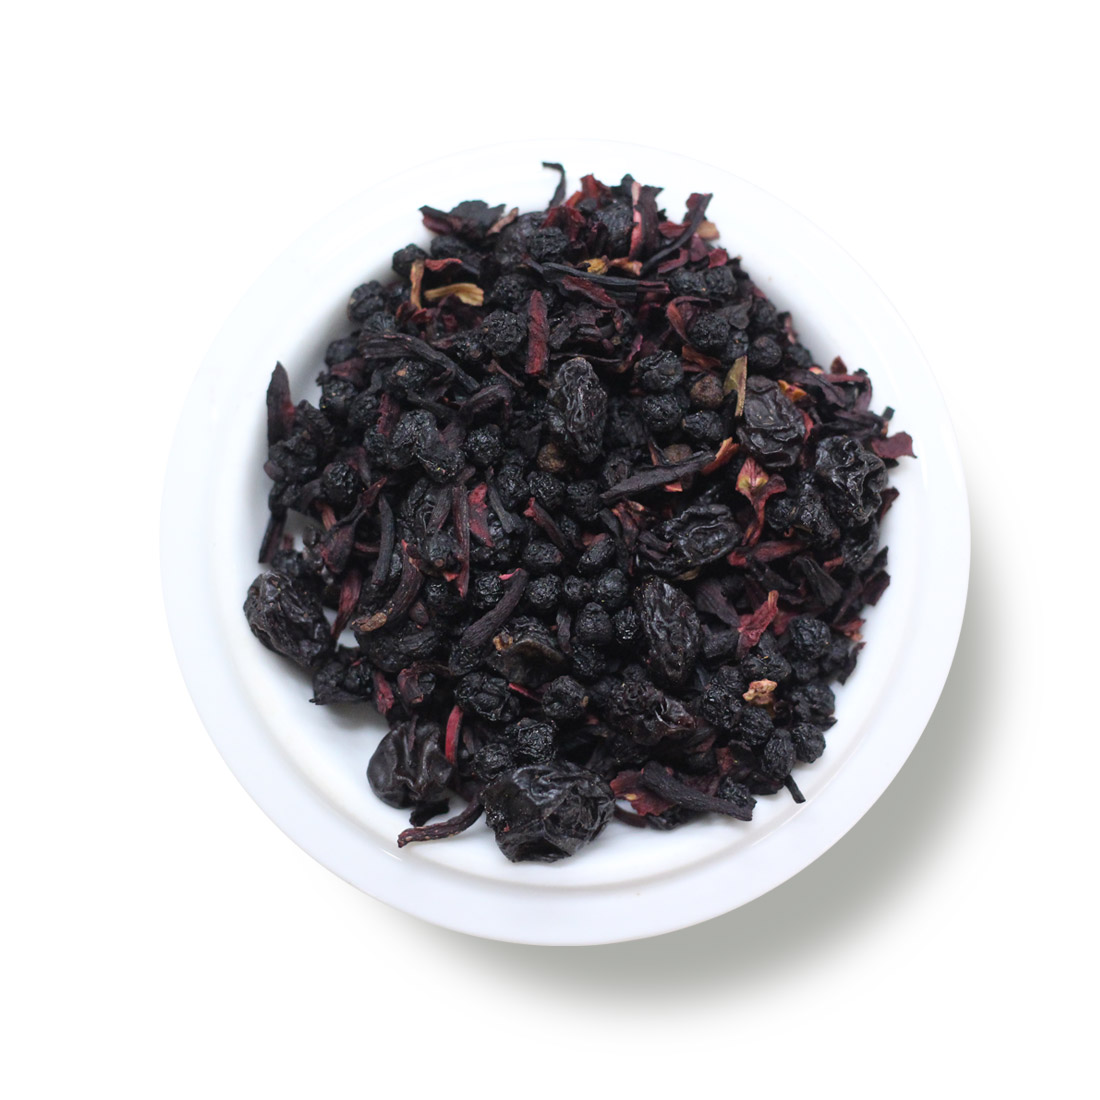 Fruit Tea Organic Super Antioxidant Berries